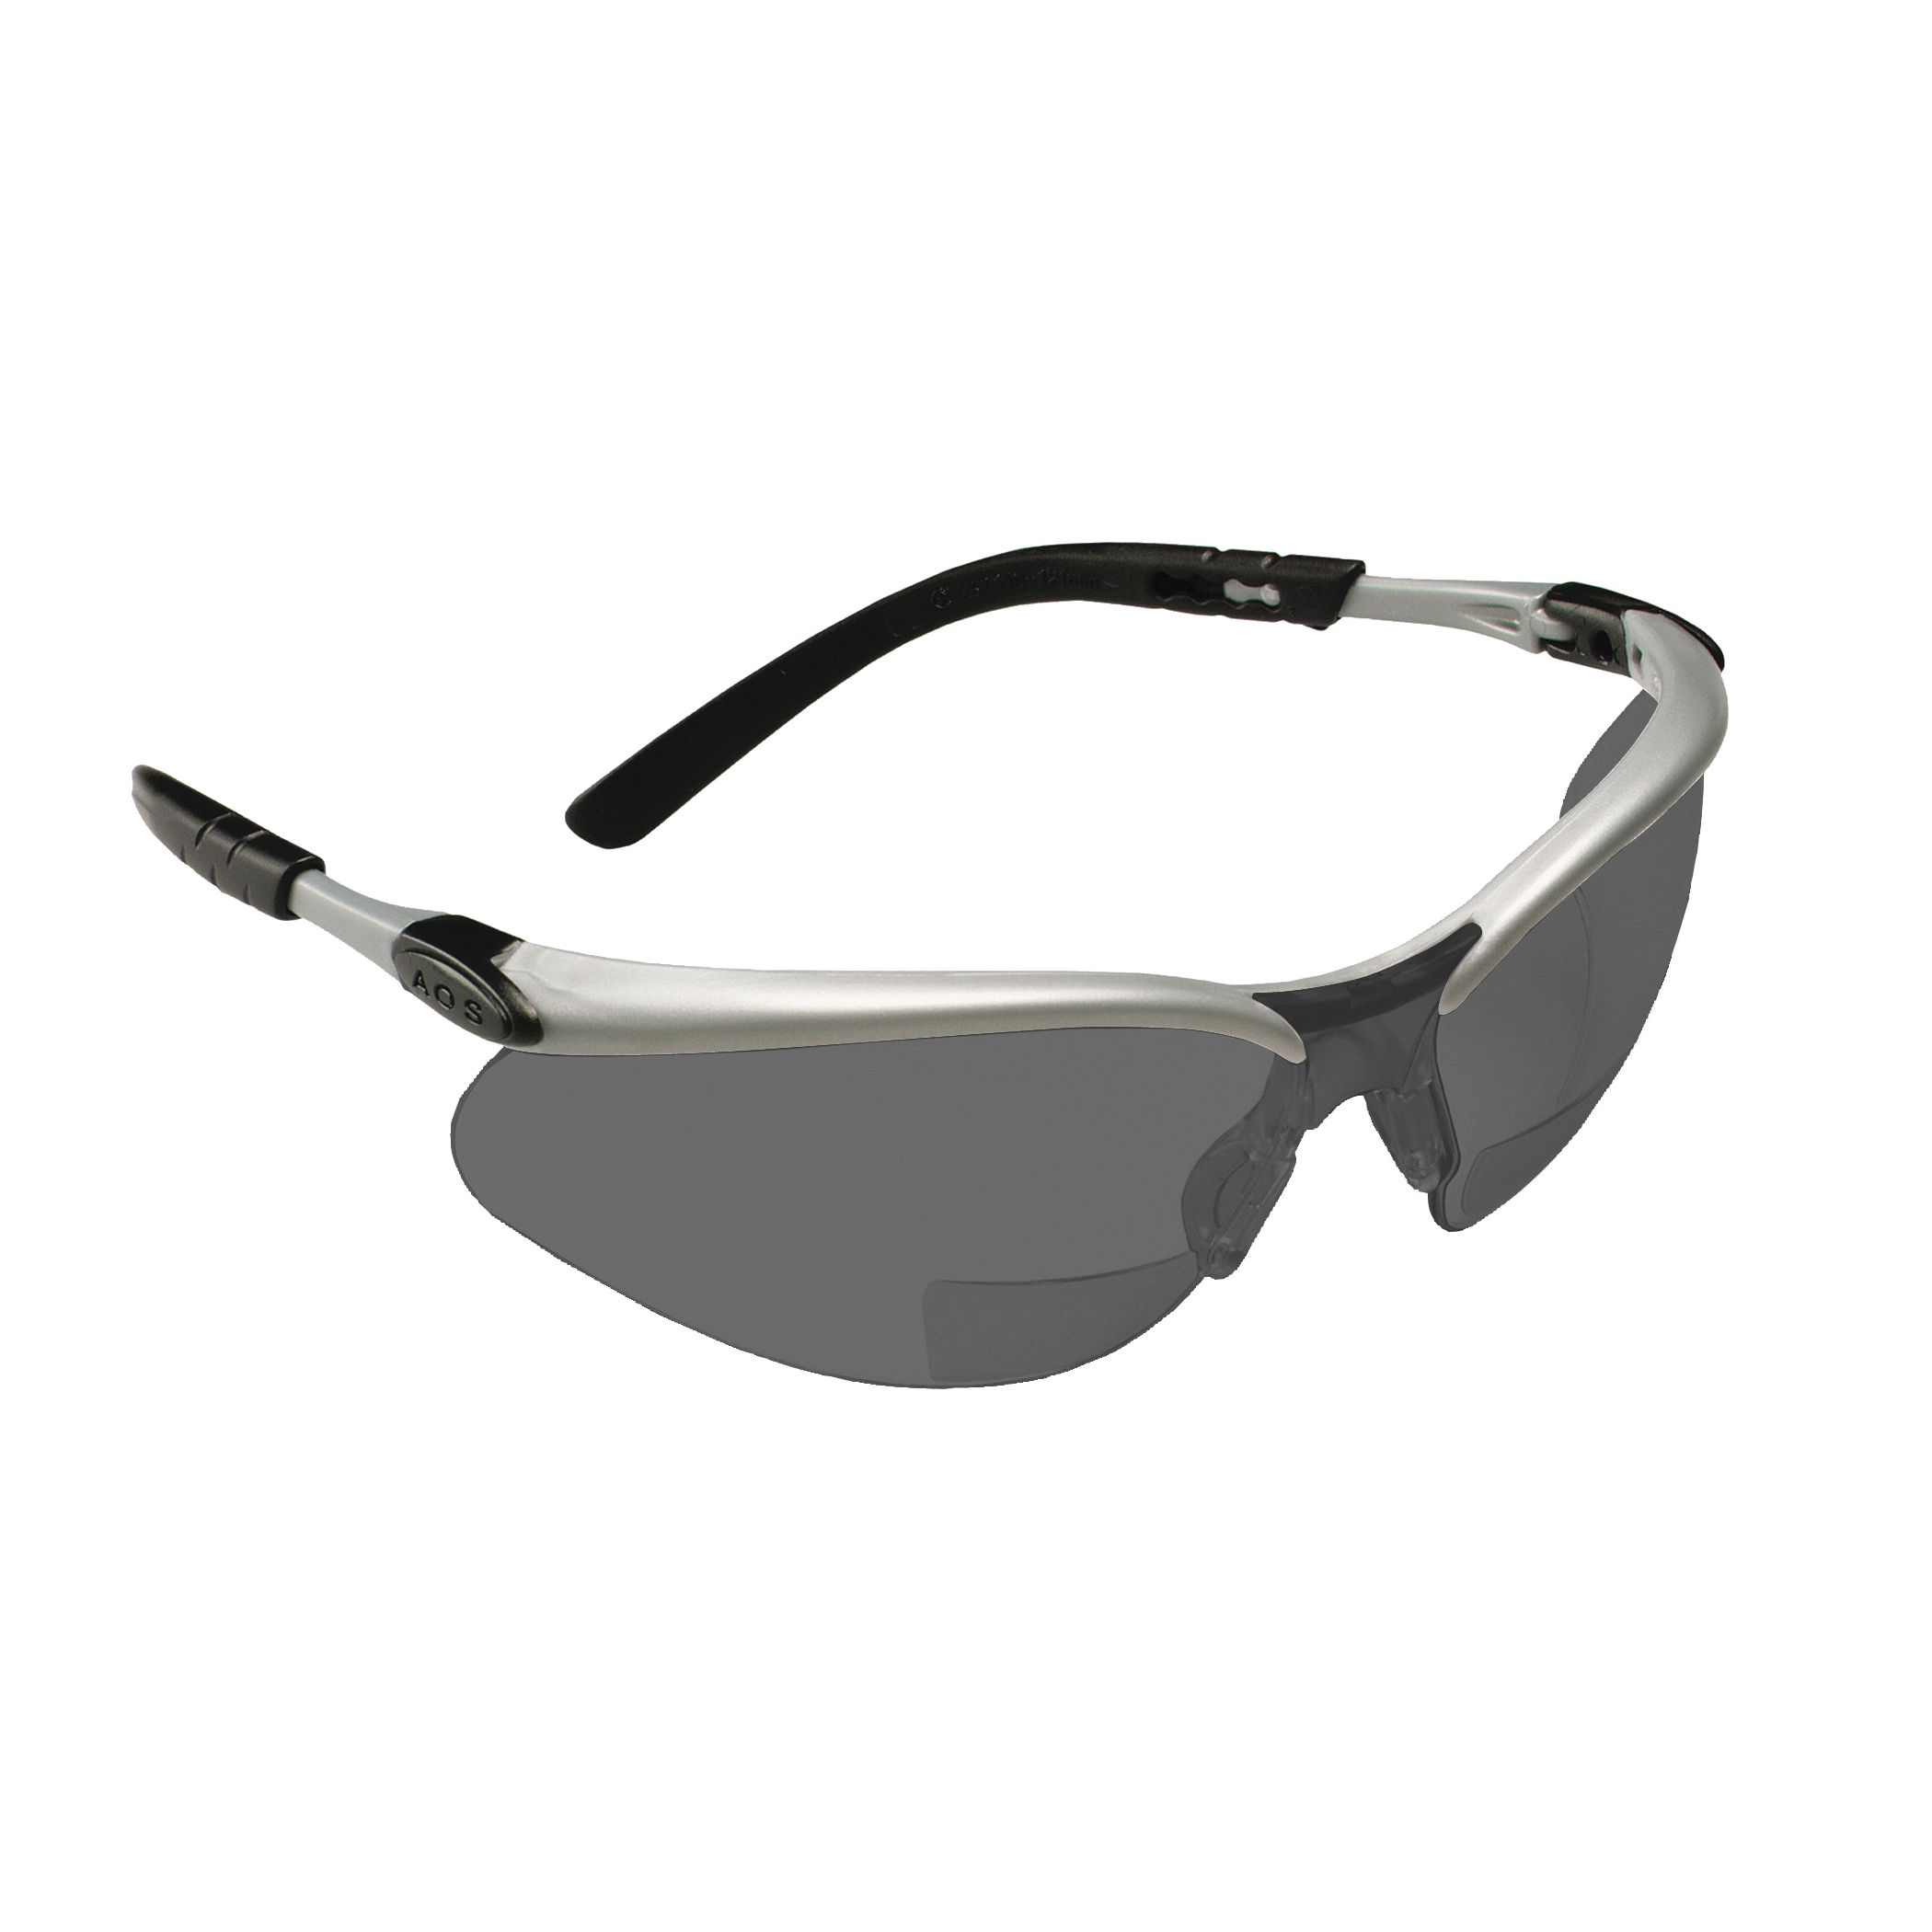 Glasses,Safety,Bifocal 2.0